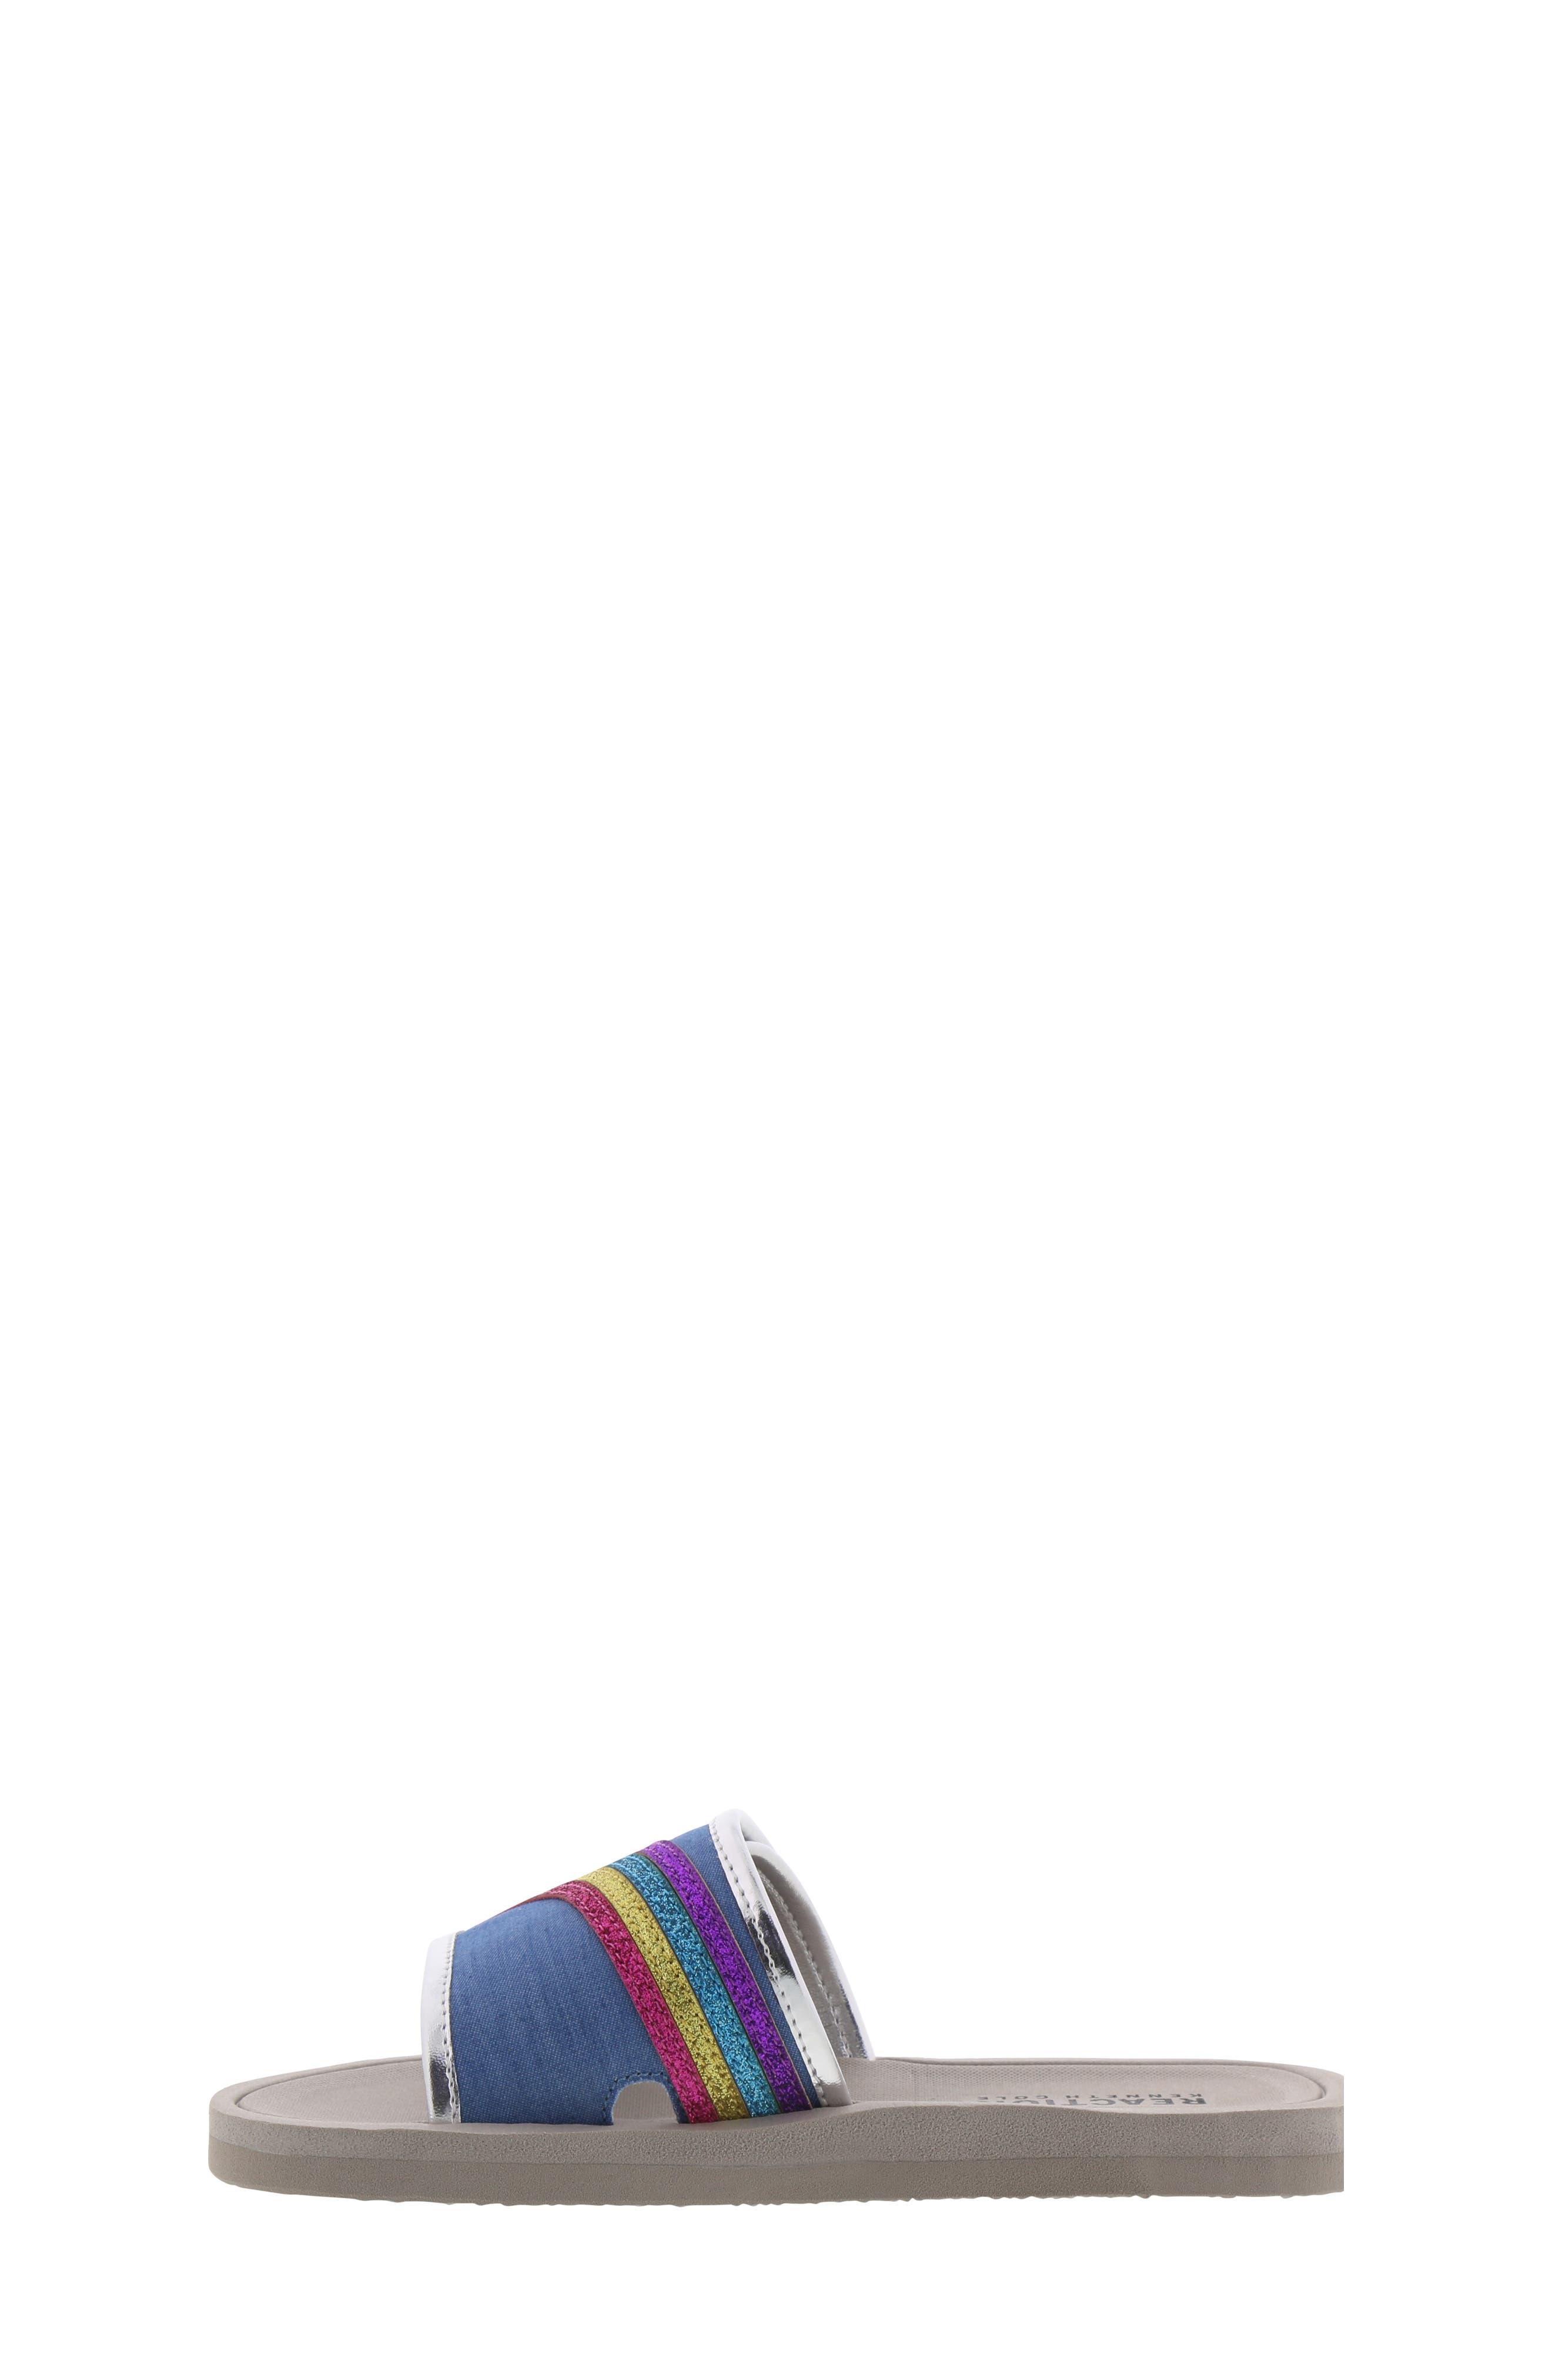 REACTION KENNETH COLE, Elise Karla Rainbow Slide Sandal, Alternate thumbnail 8, color, DENIM